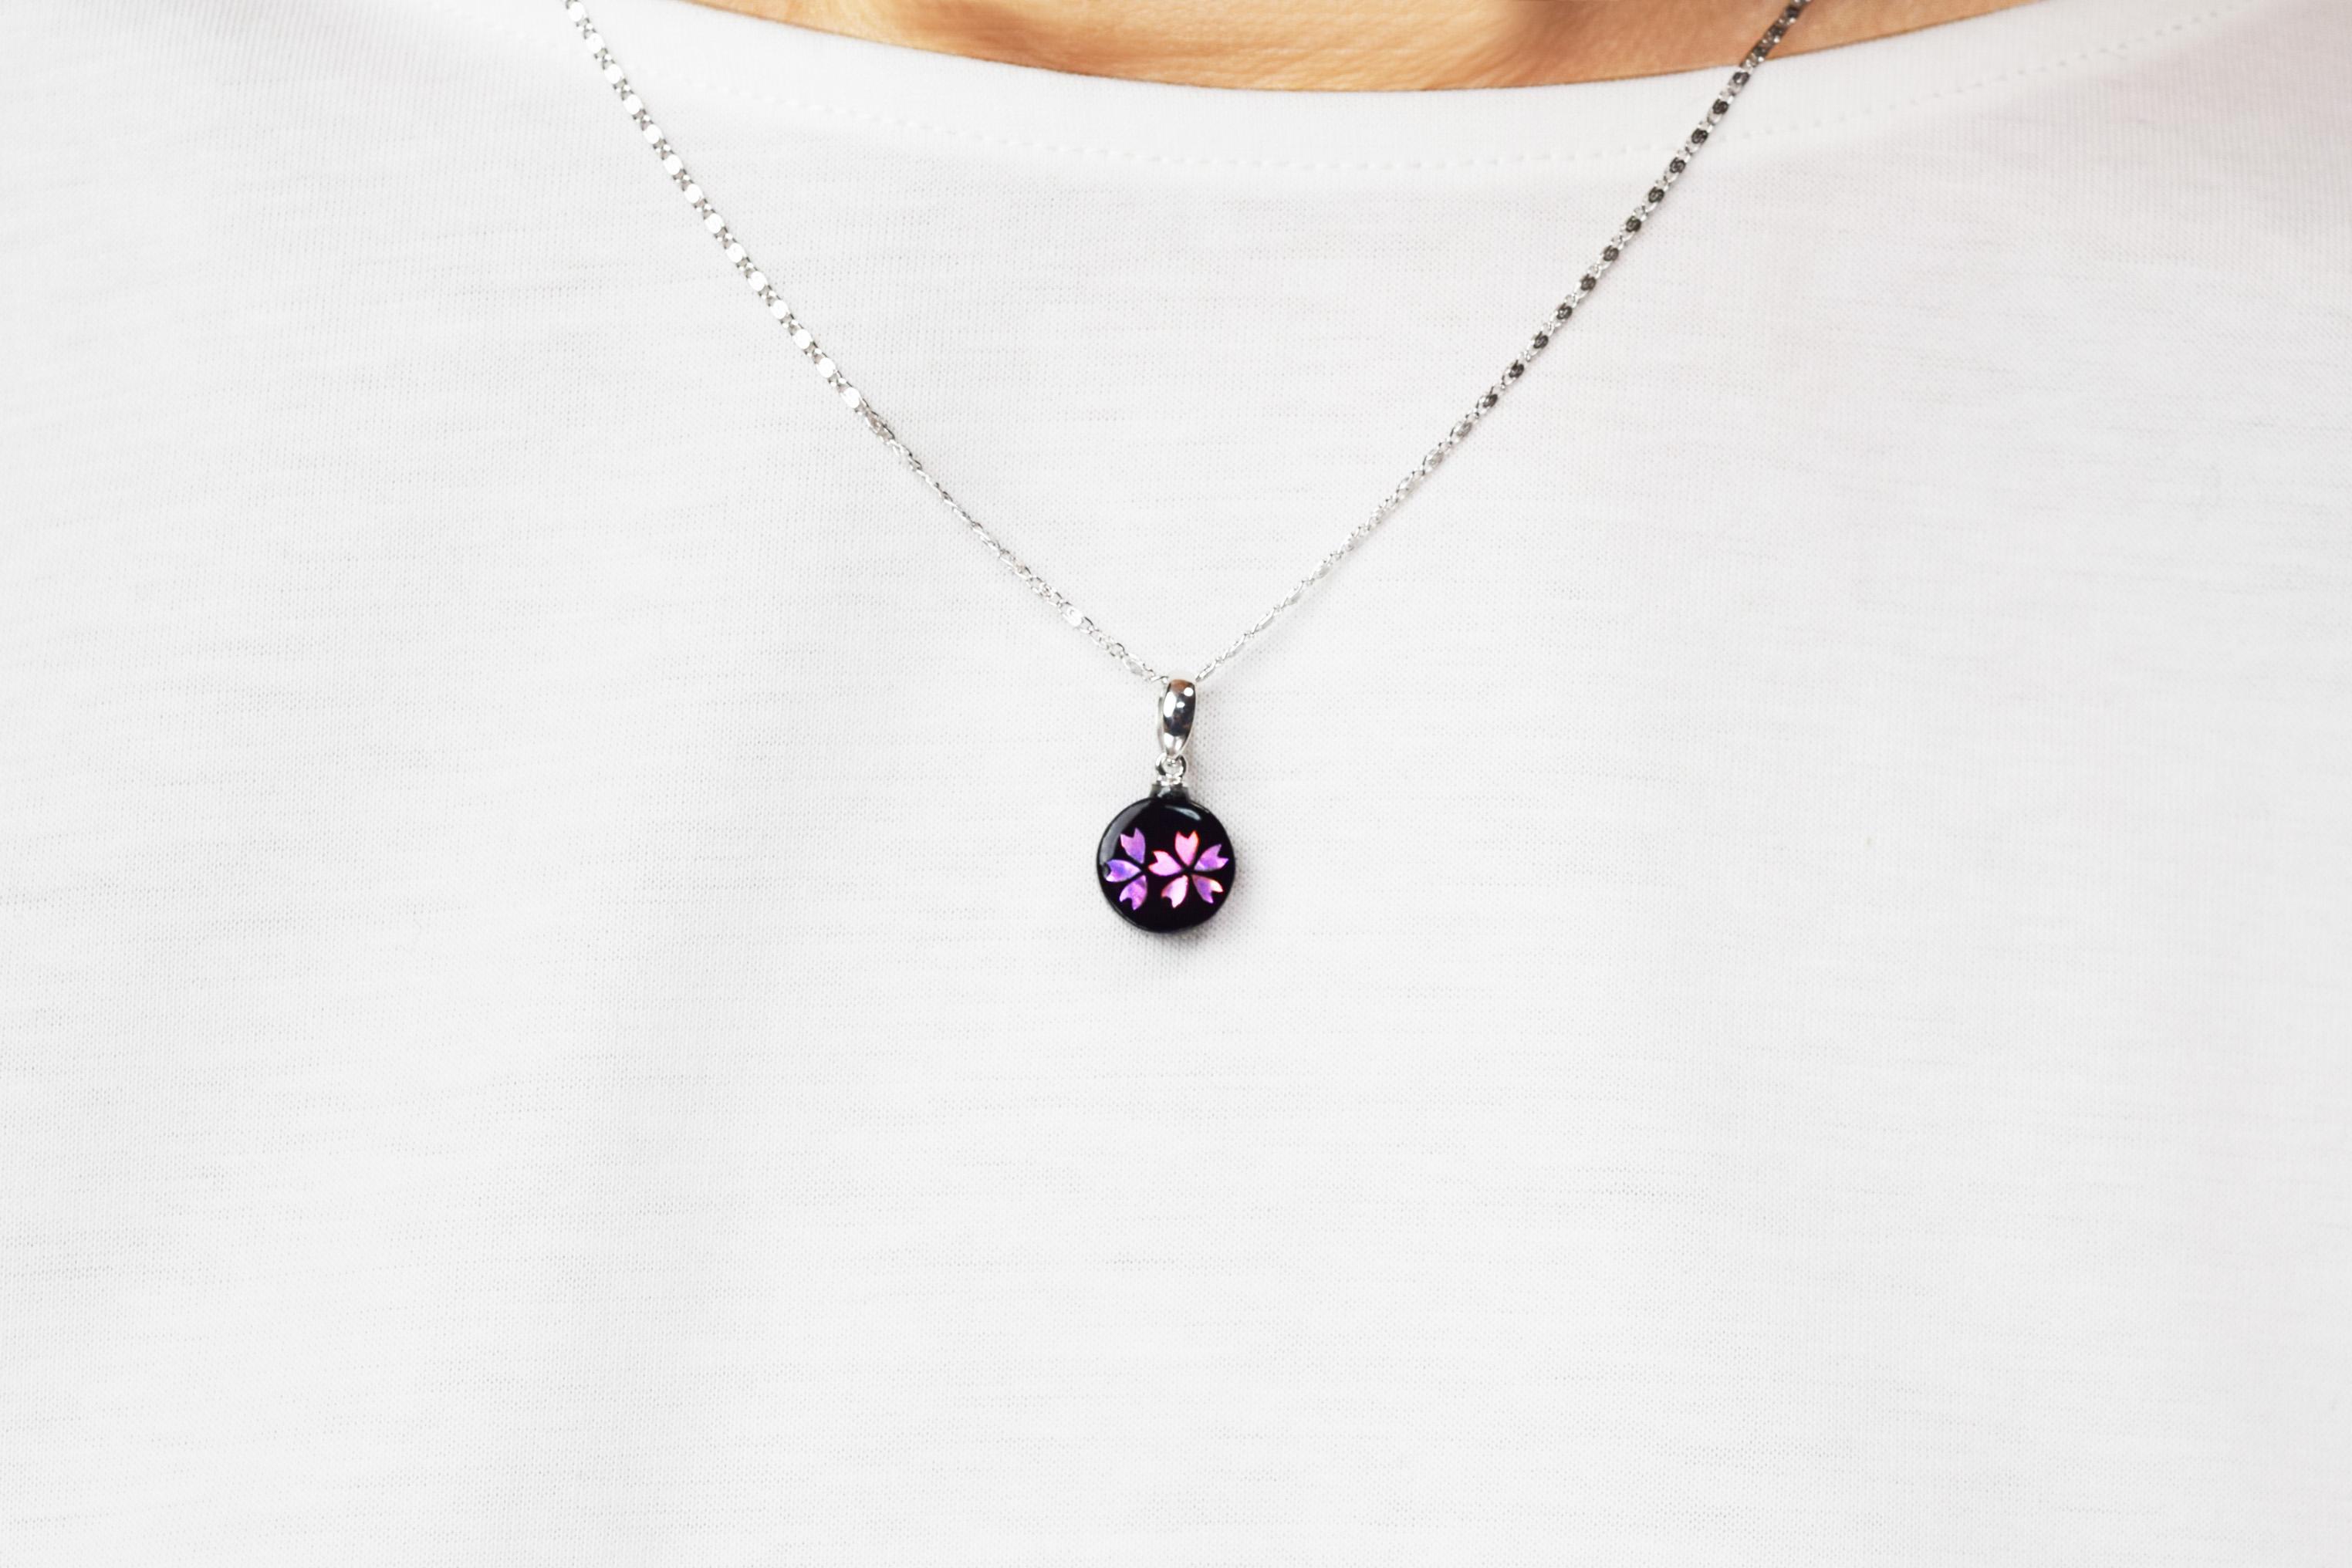 raden_necklace_sakura_s_pnk